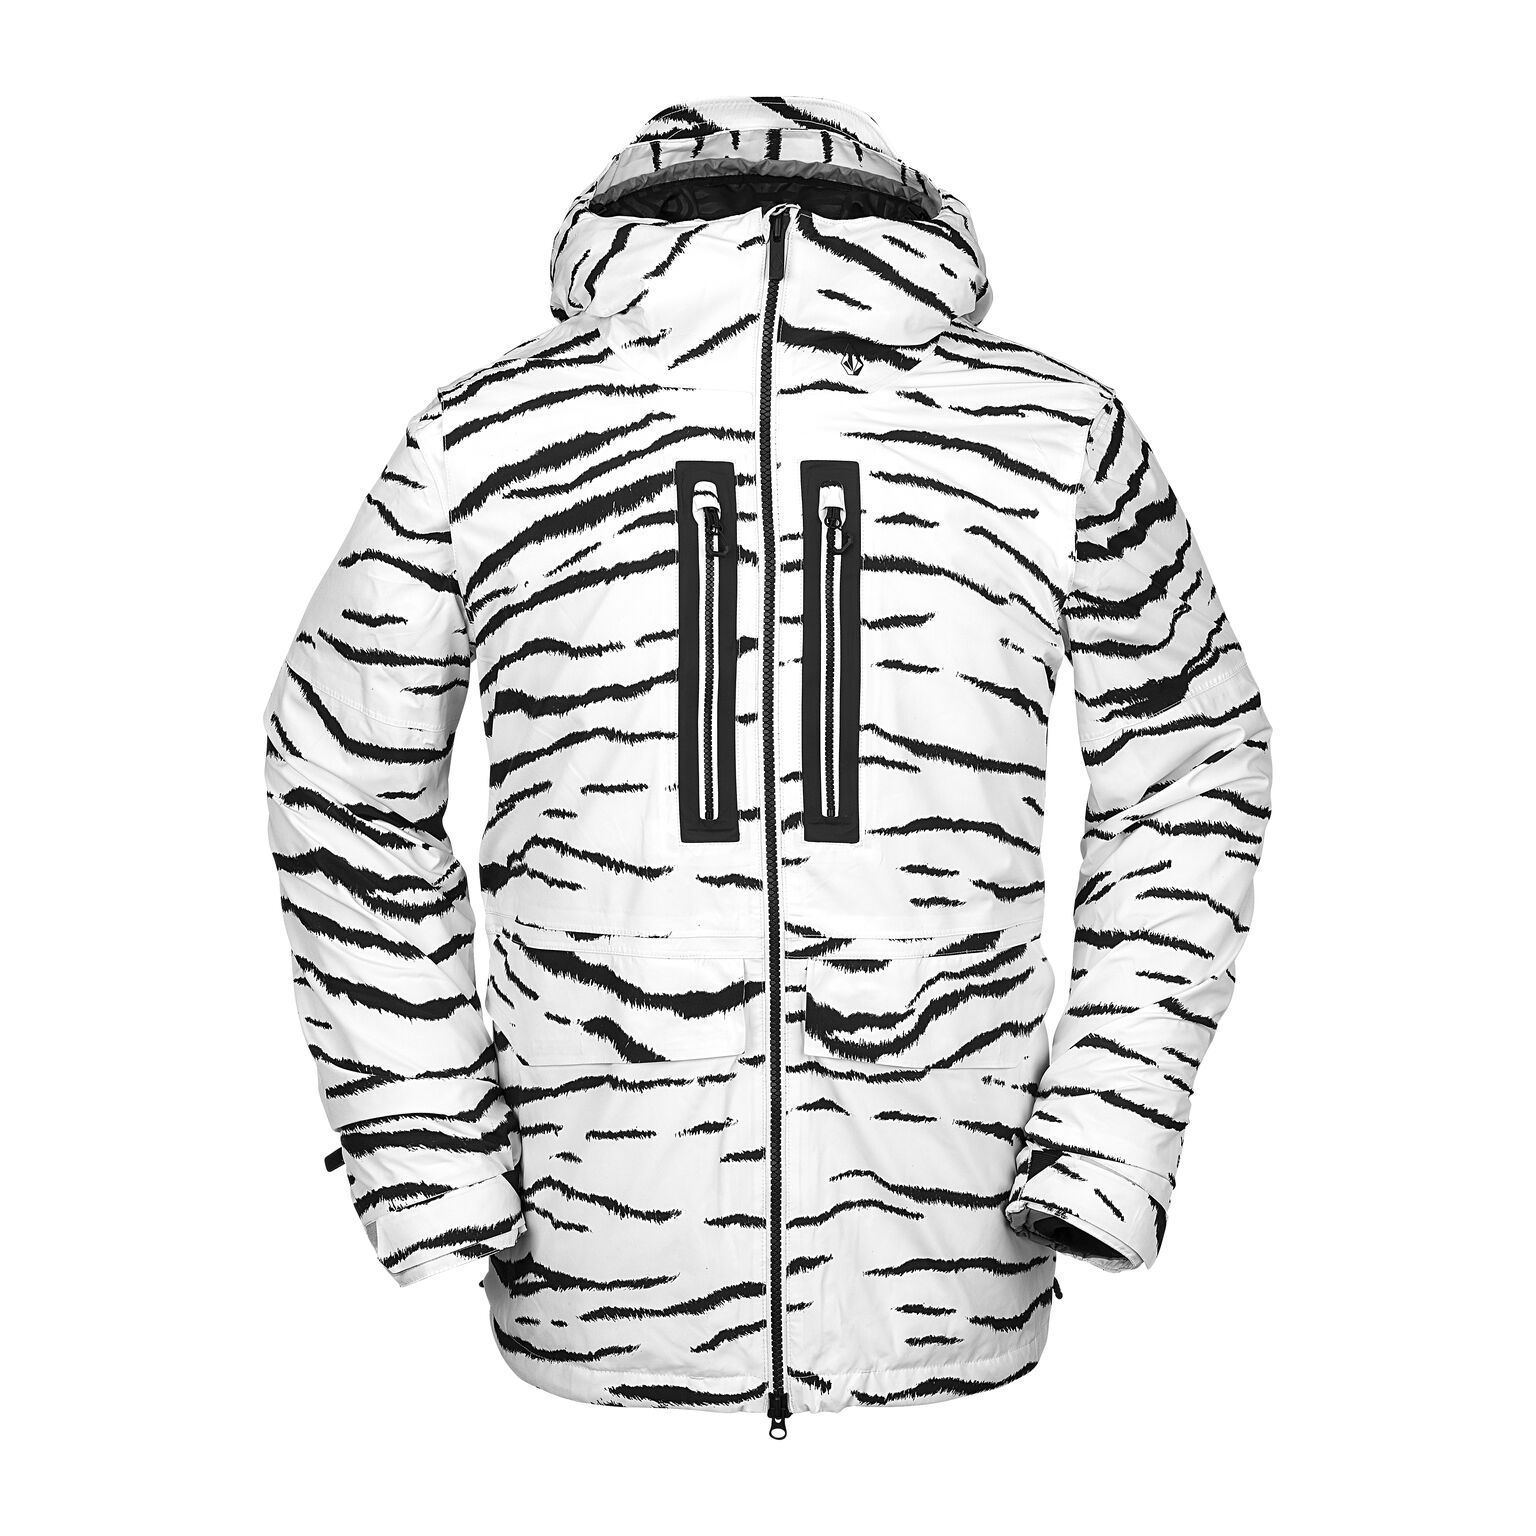 Giacca Snowboard Volcom Goretex White Tiger '21